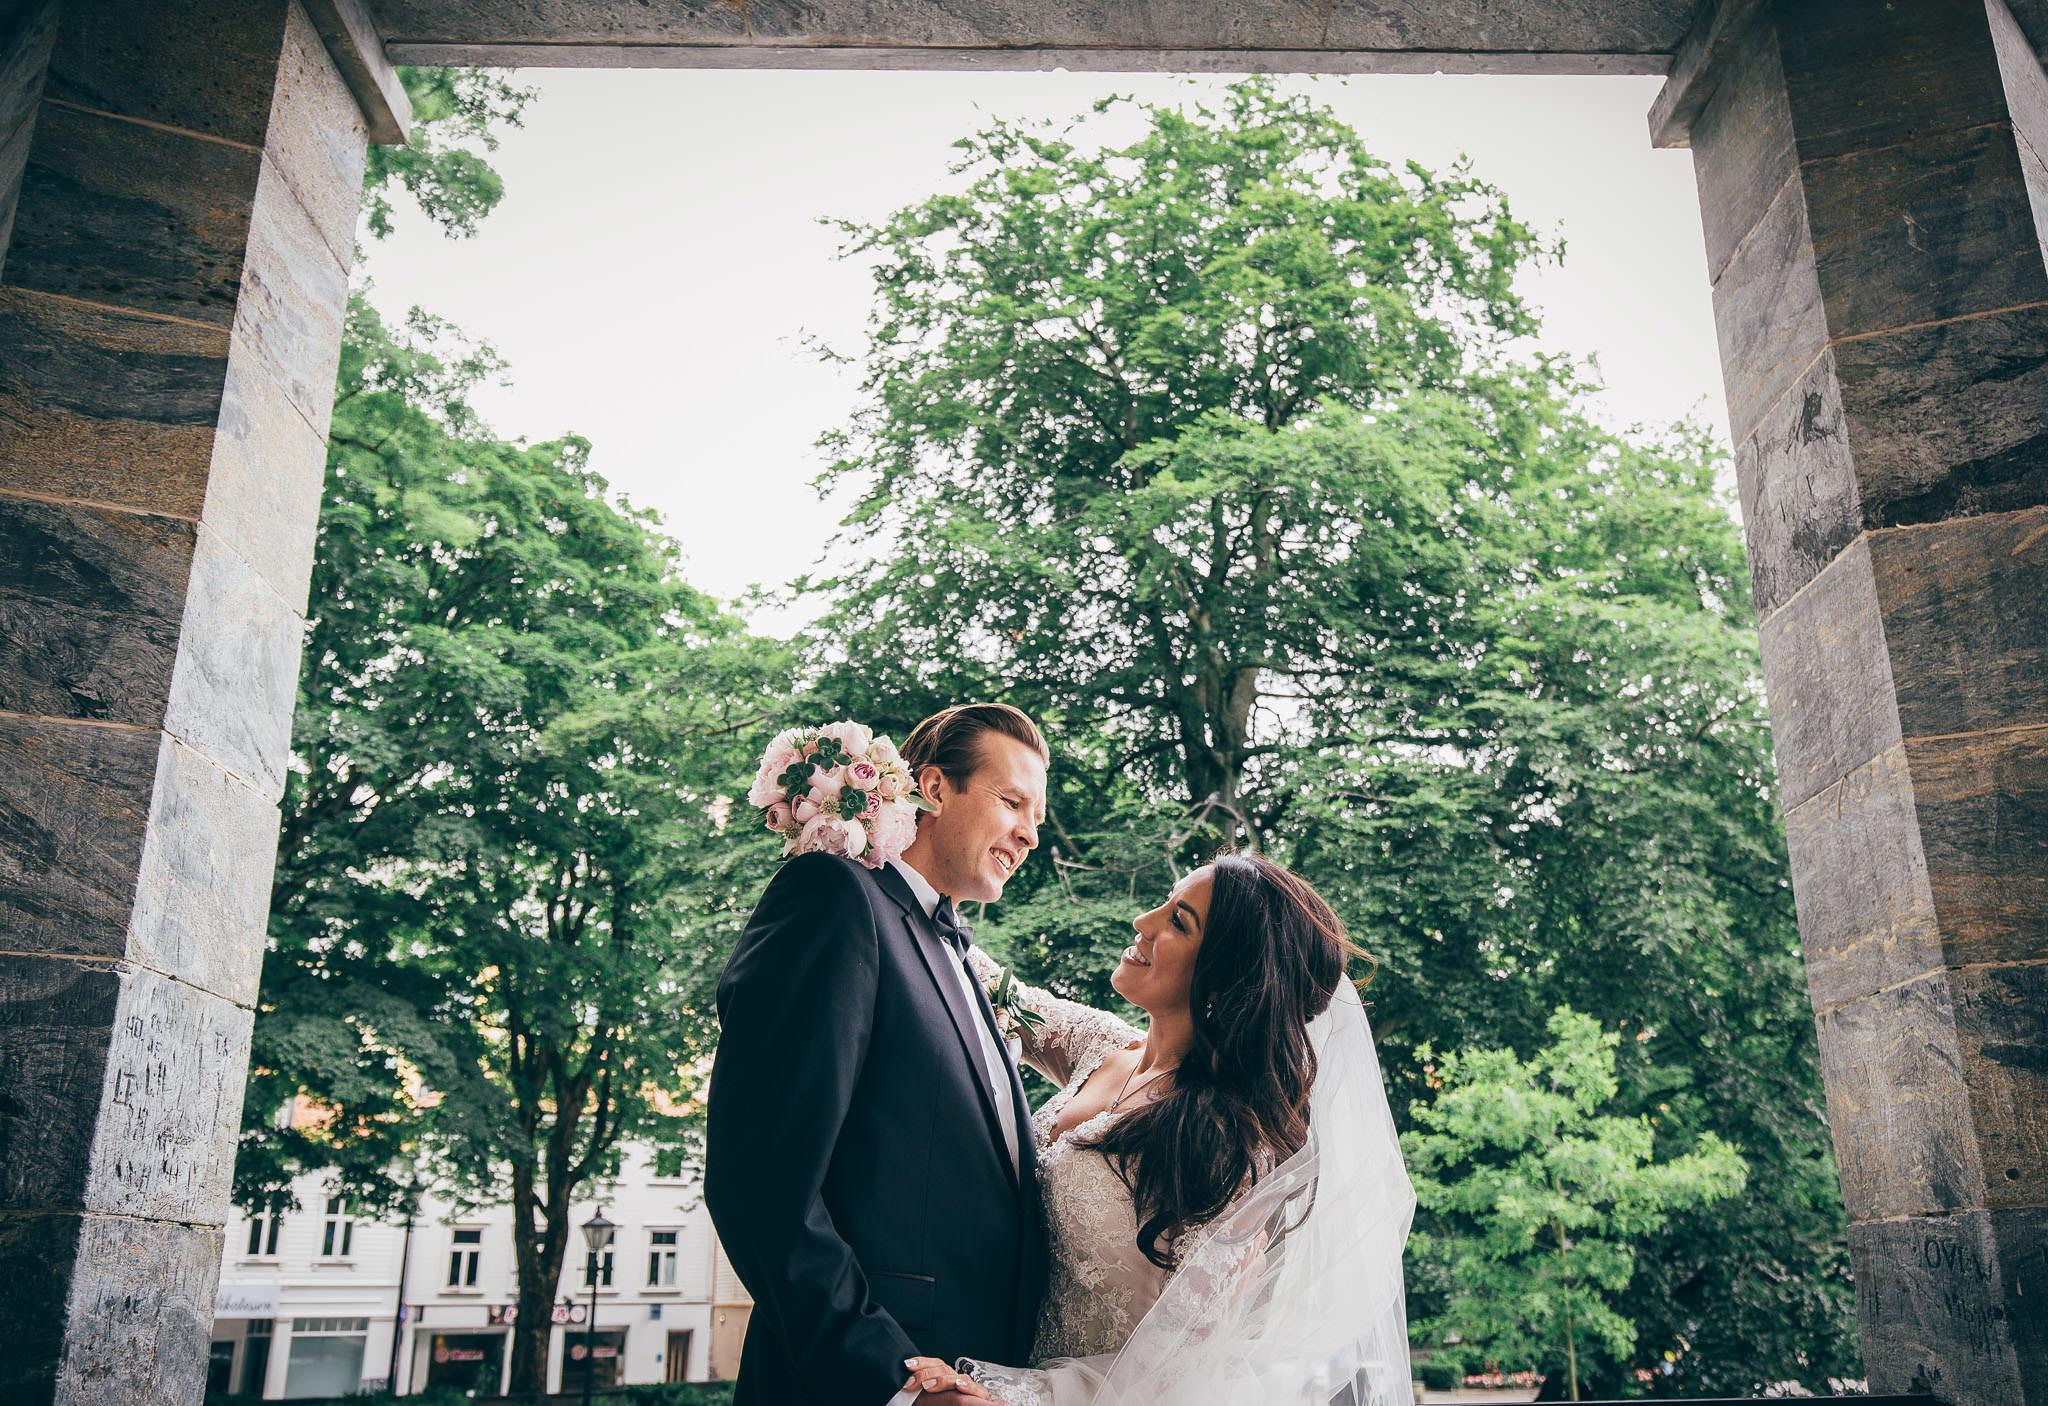 Wedding+Photographer+Norway+Bryllupsfotograf+Casey+Arneson+MK-149.jpg